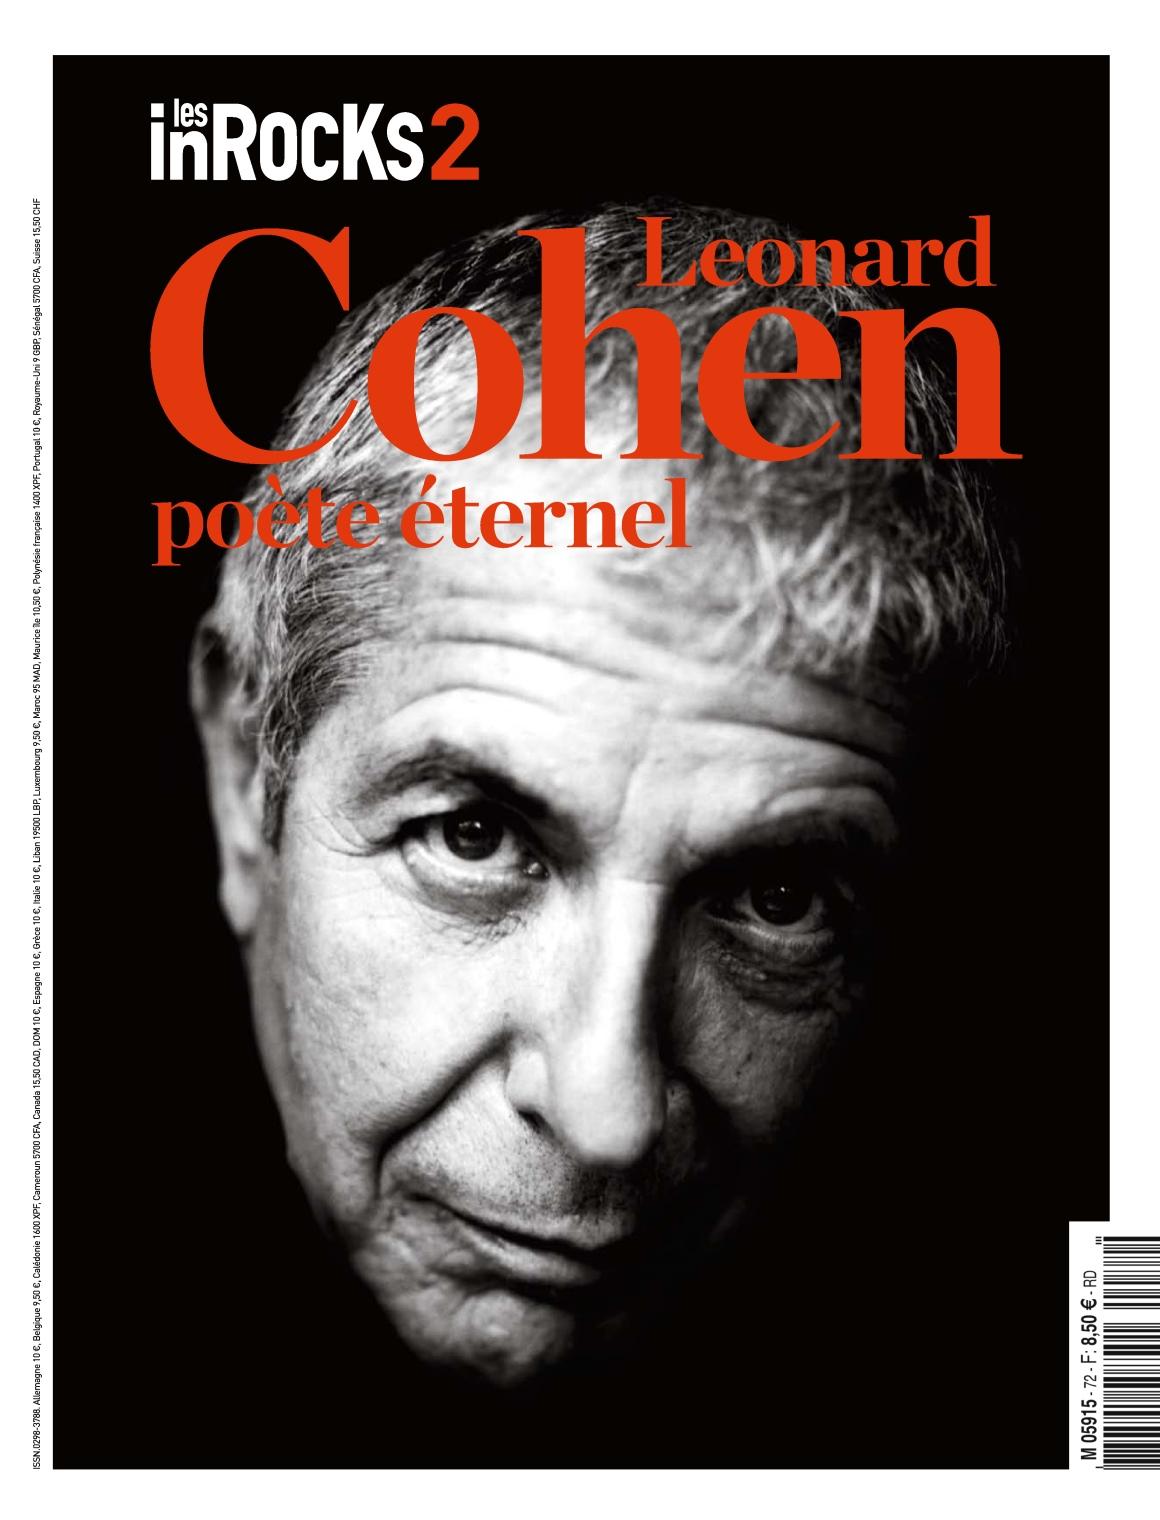 Les Inrocks 2 72 - Leonard Cohen 2016